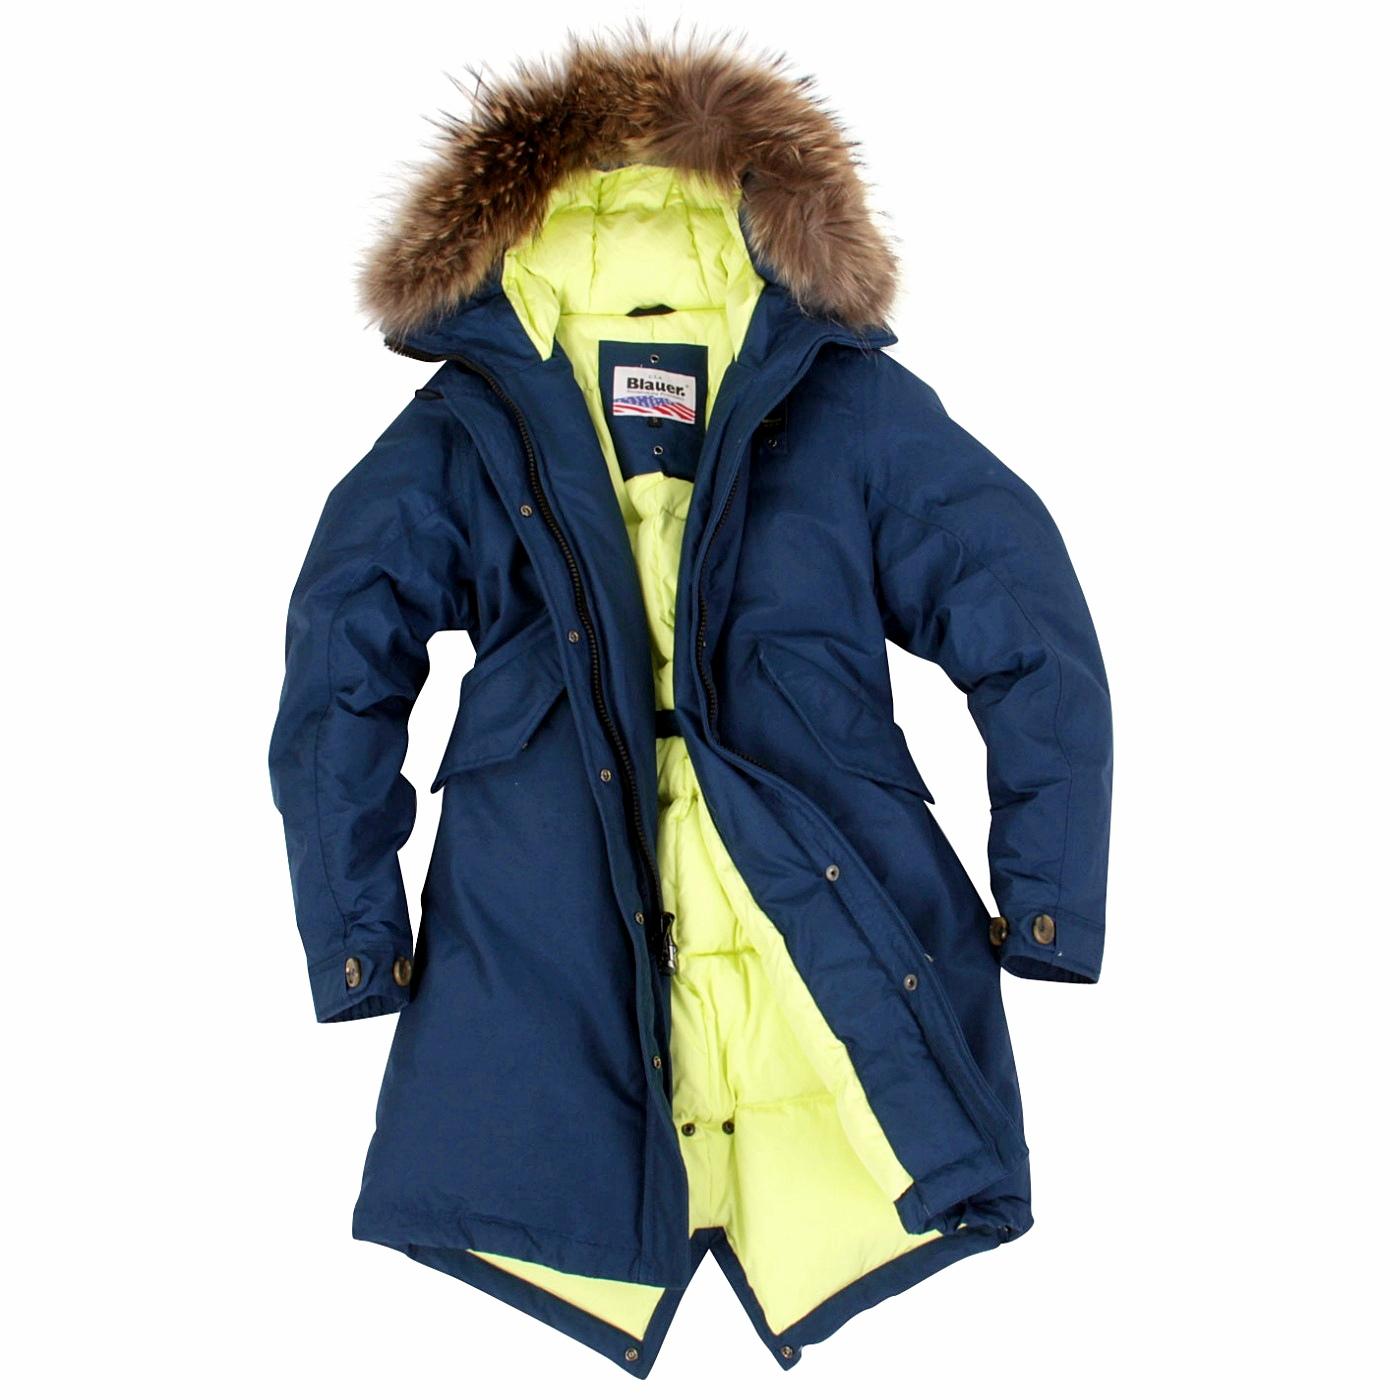 blauer usa damen winter daunen parka mantel jacke limited blue bld03045 ebay. Black Bedroom Furniture Sets. Home Design Ideas